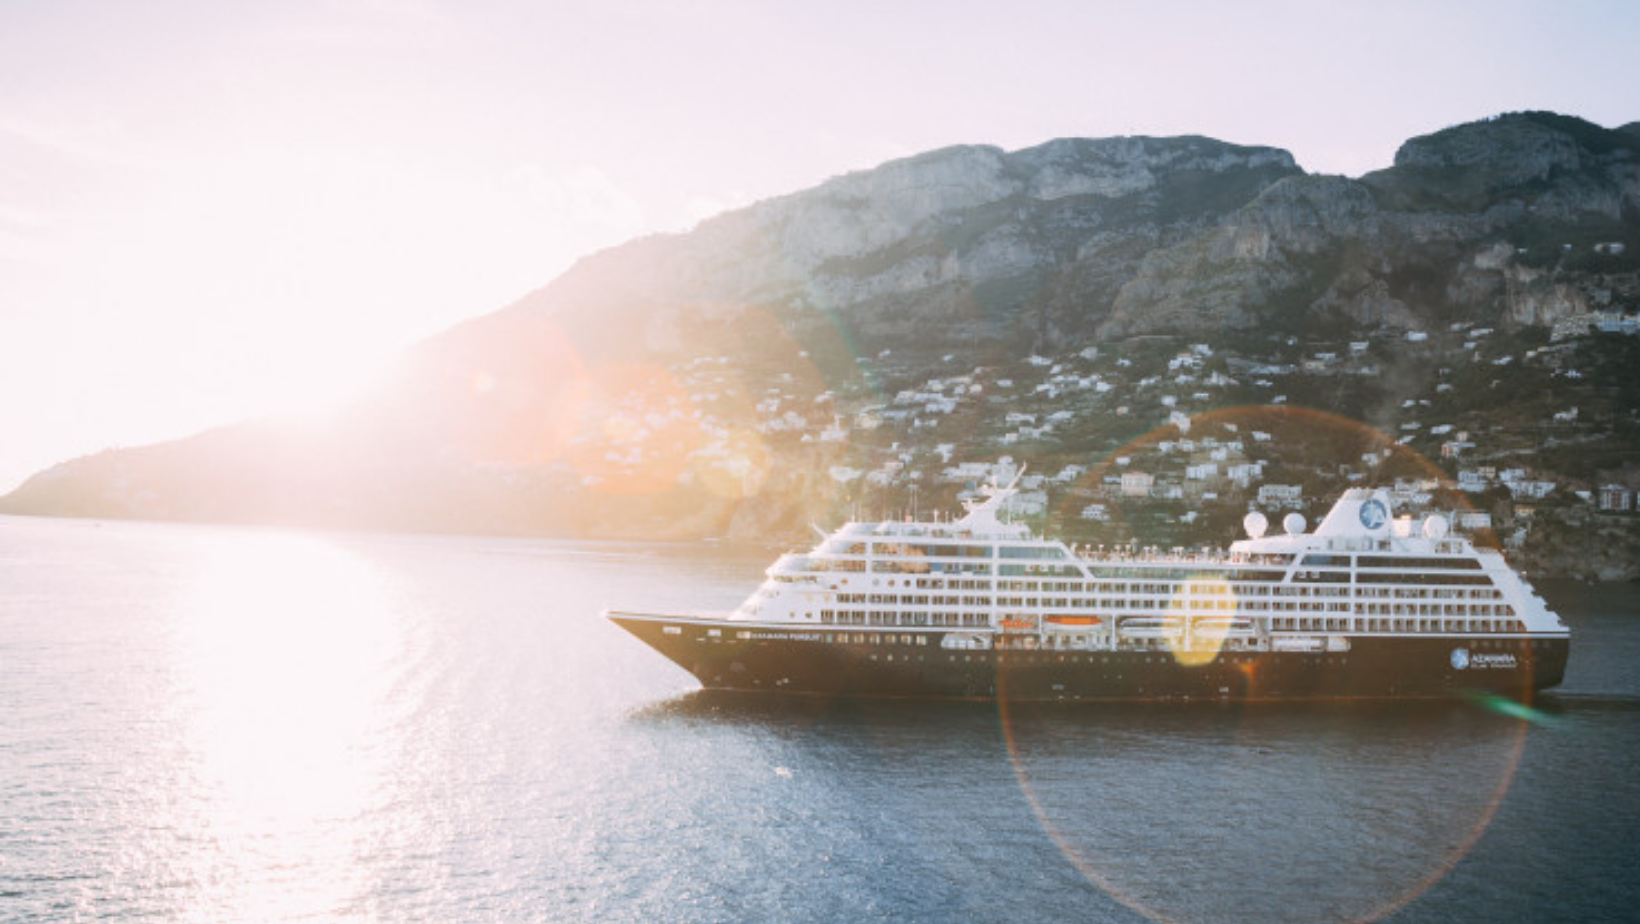 Royal Caribbean Group объявила о продаже бренда Azamara компании Sycamore Partners.